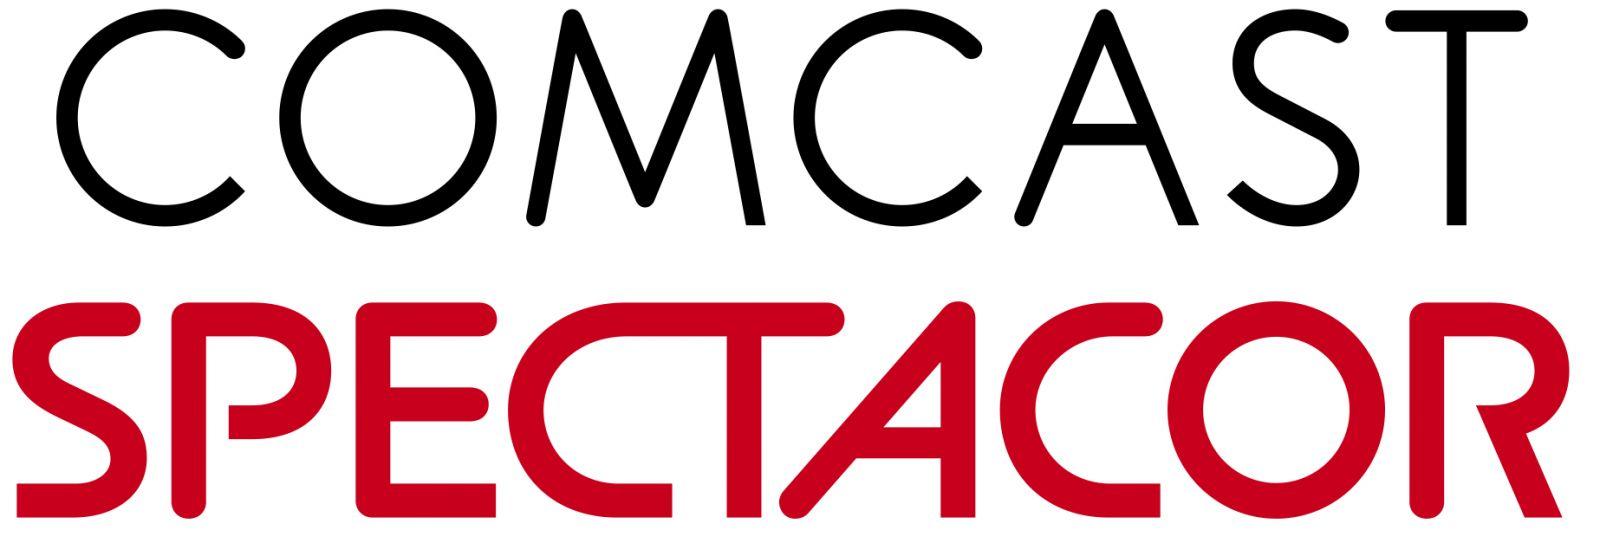 filecomcastspectacor new logojpg wikimedia commons